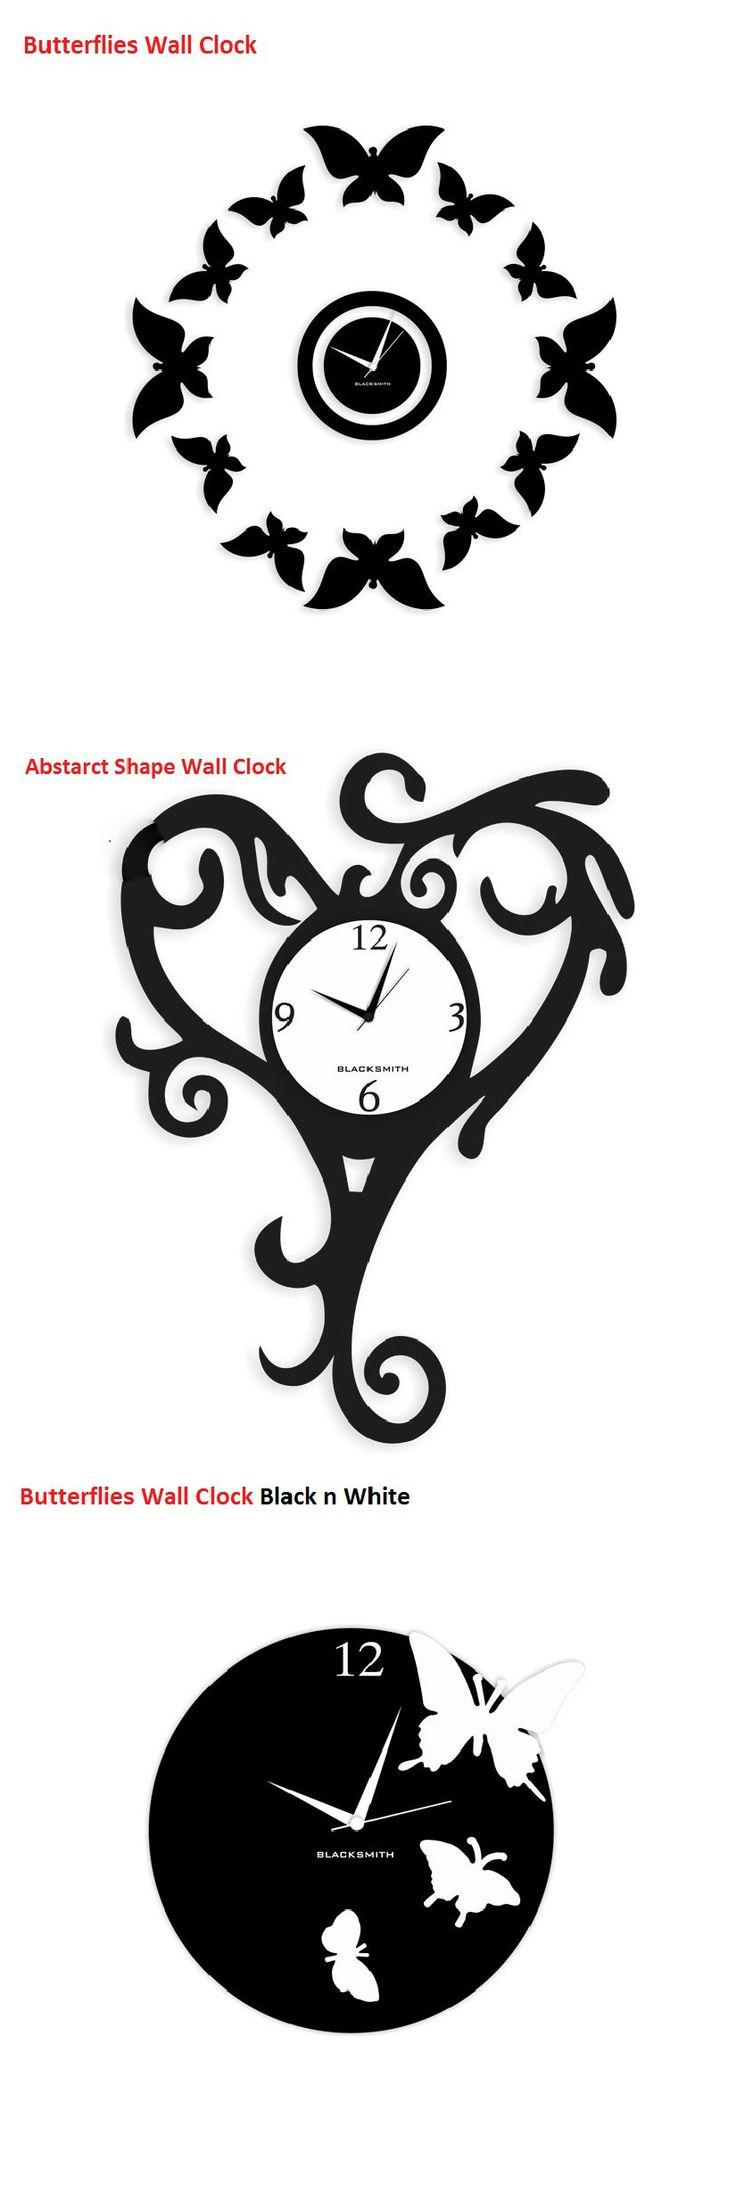 99 best clocks images on pinterest laser cutting wall clocks